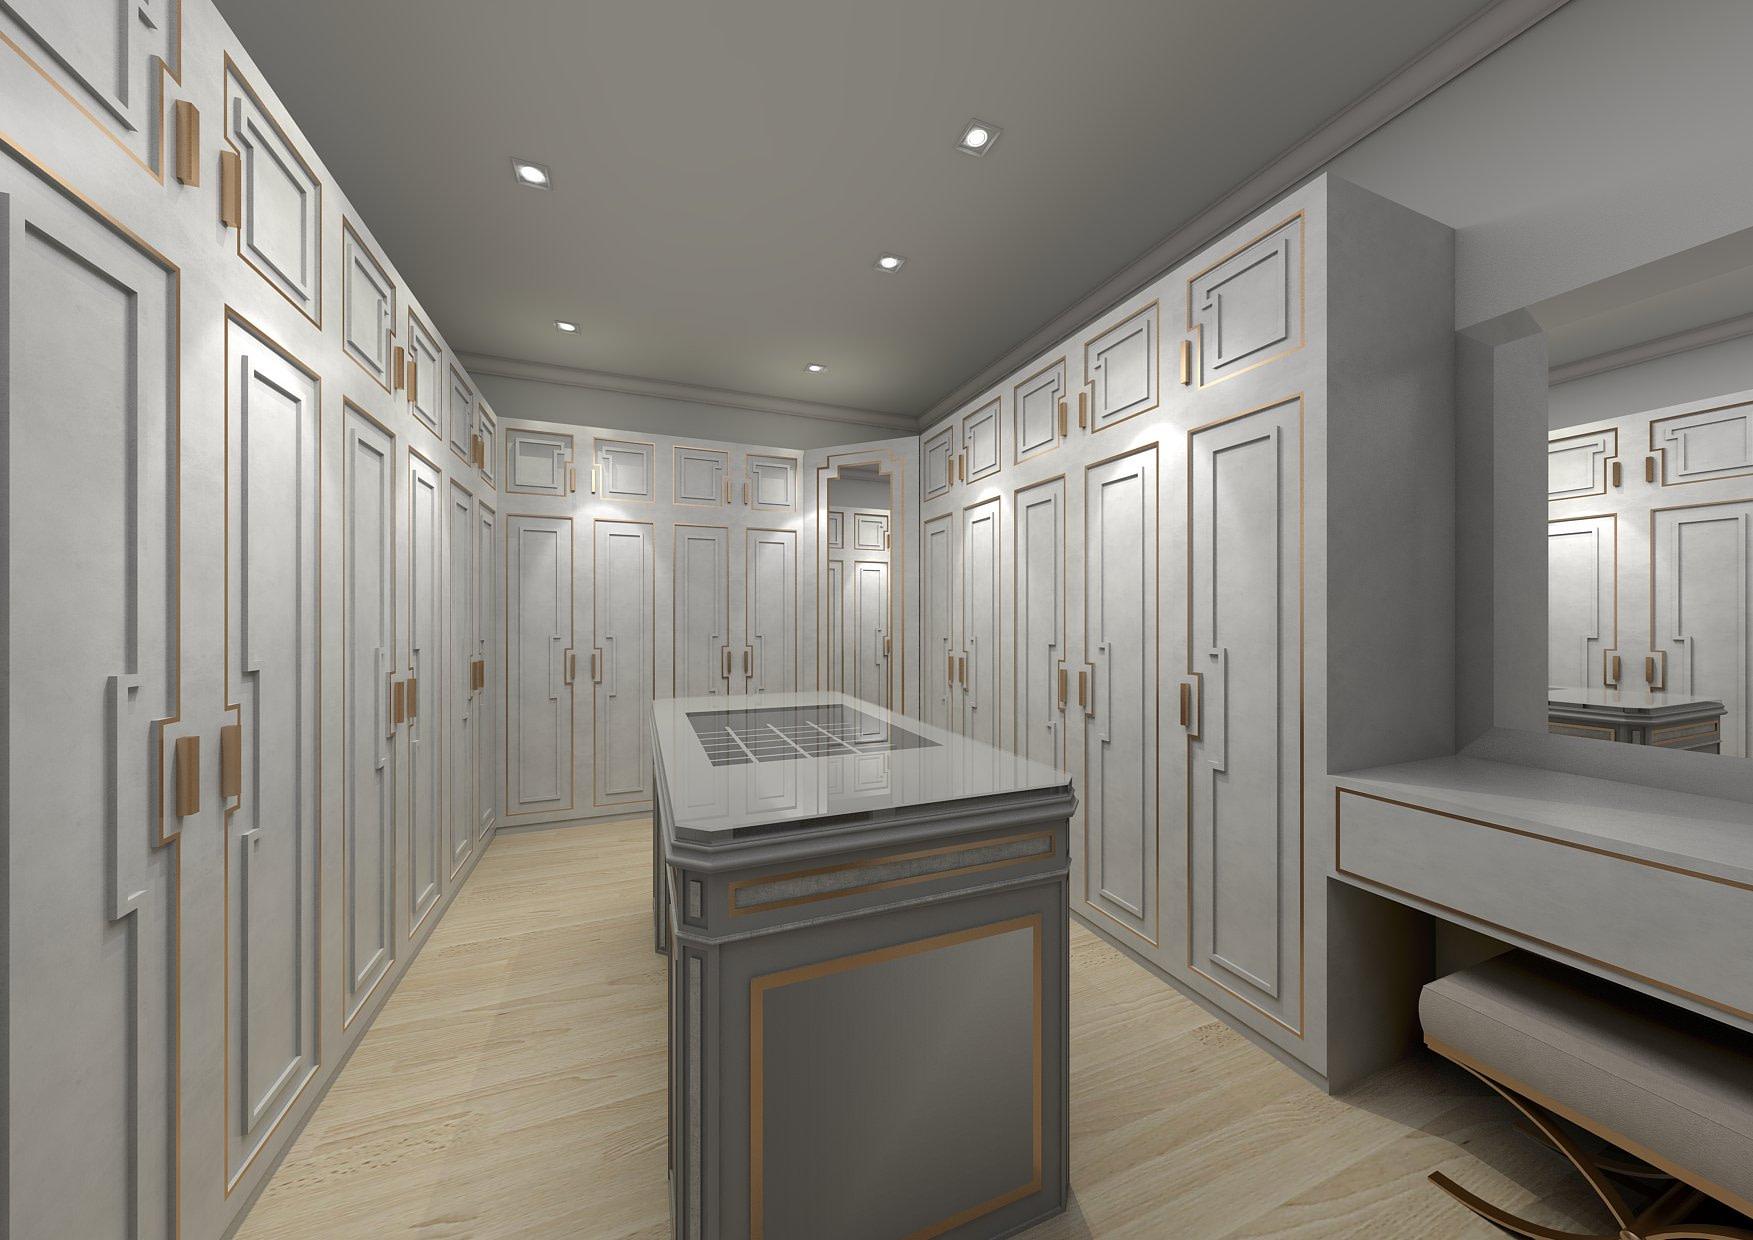 Contact Interior Design, Home Furnishing & Renovation | Laurea 1